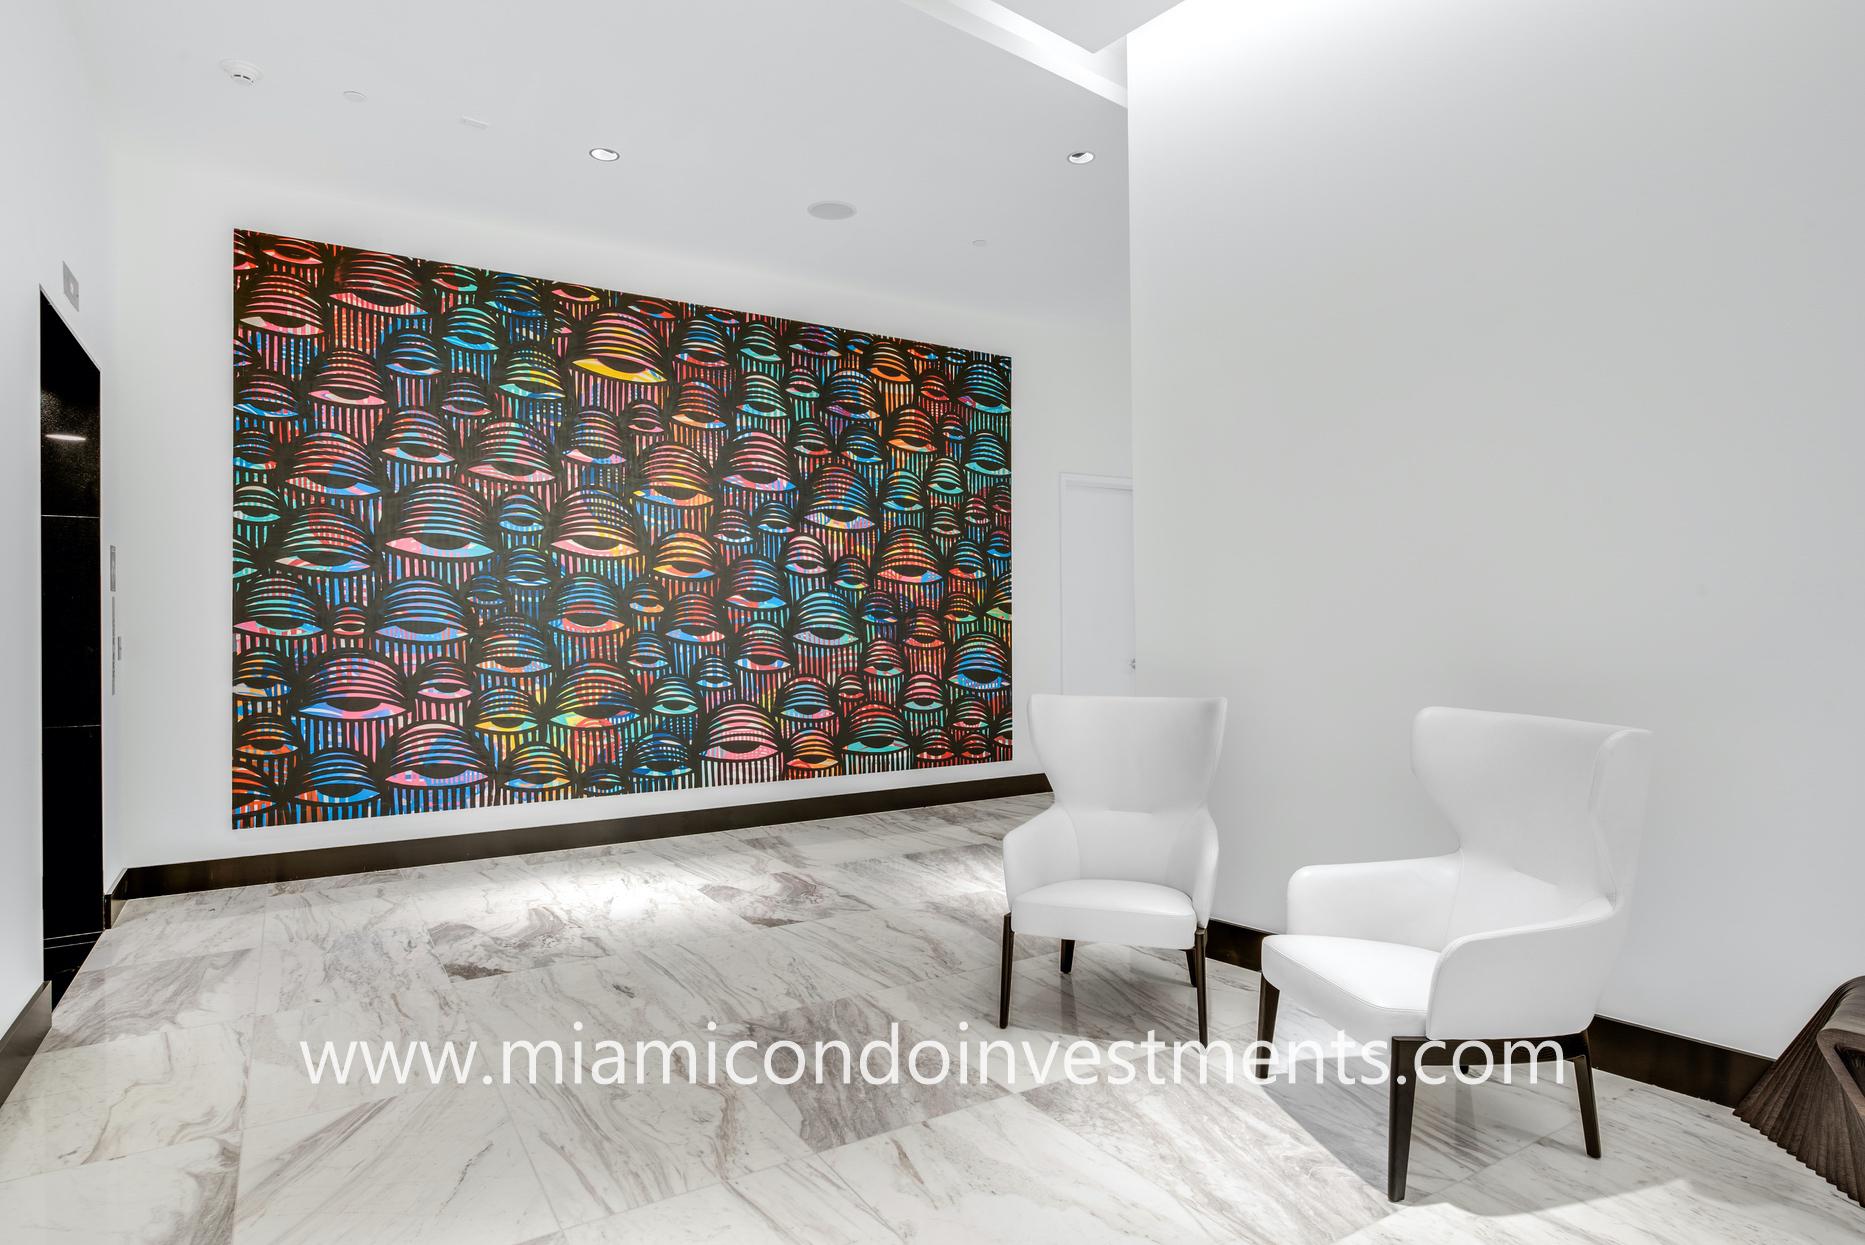 Paramount Miami elevator lobby